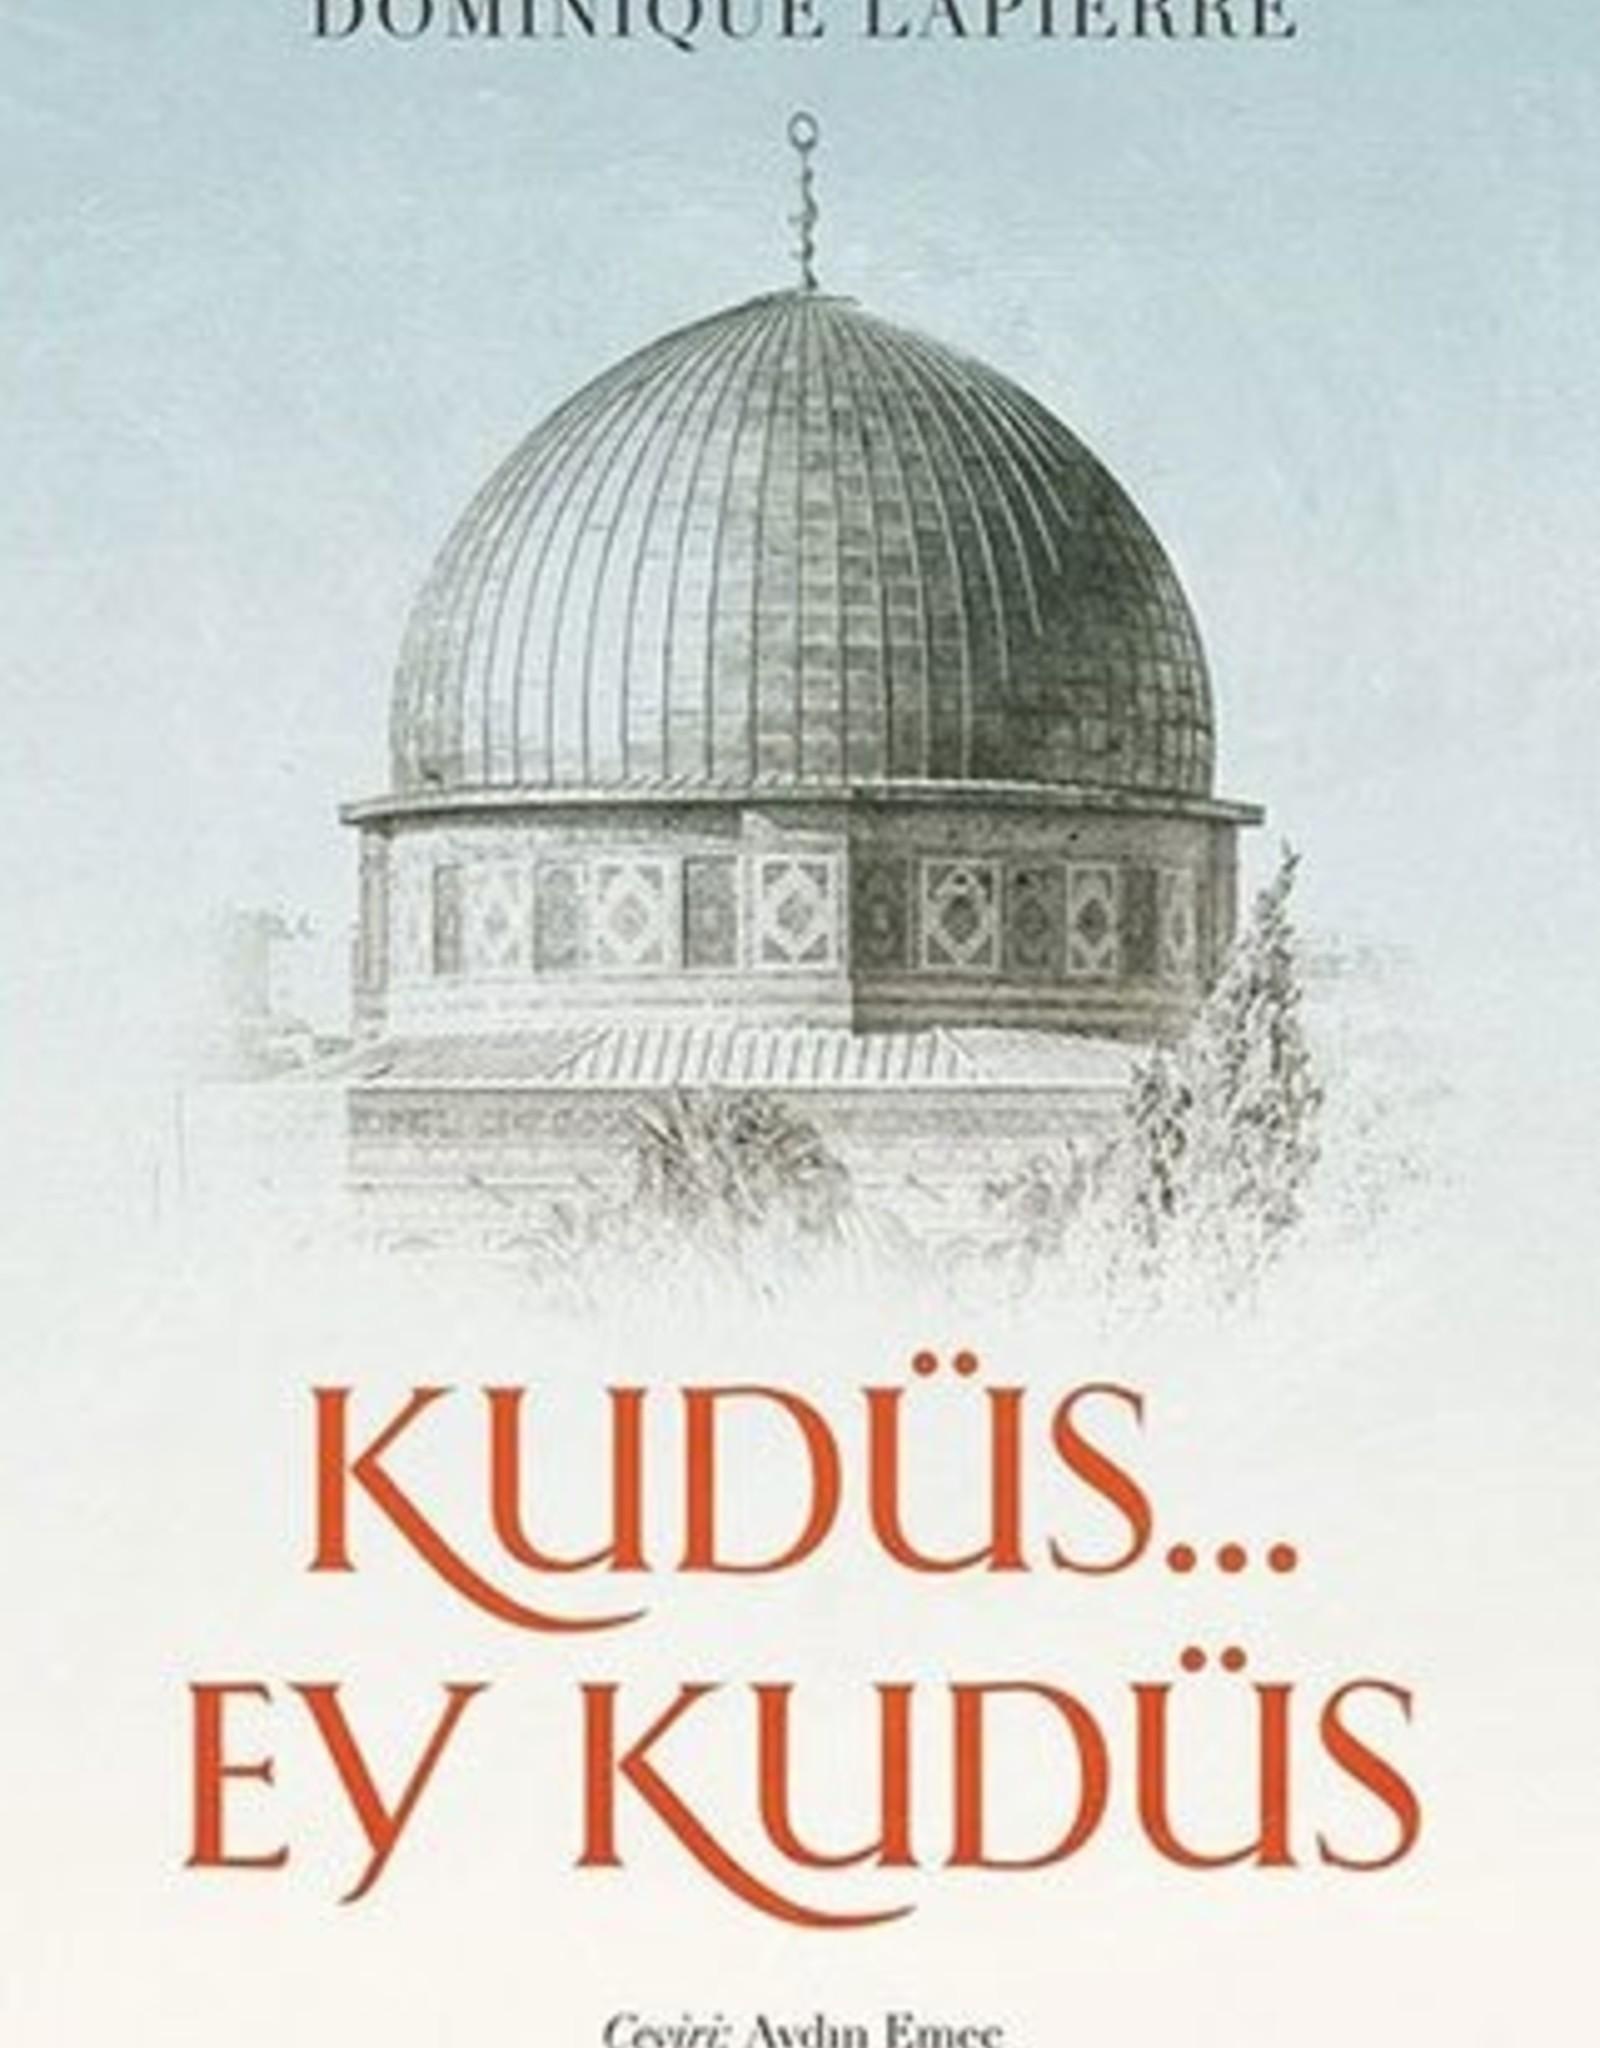 Kudüs Ey Kudüs